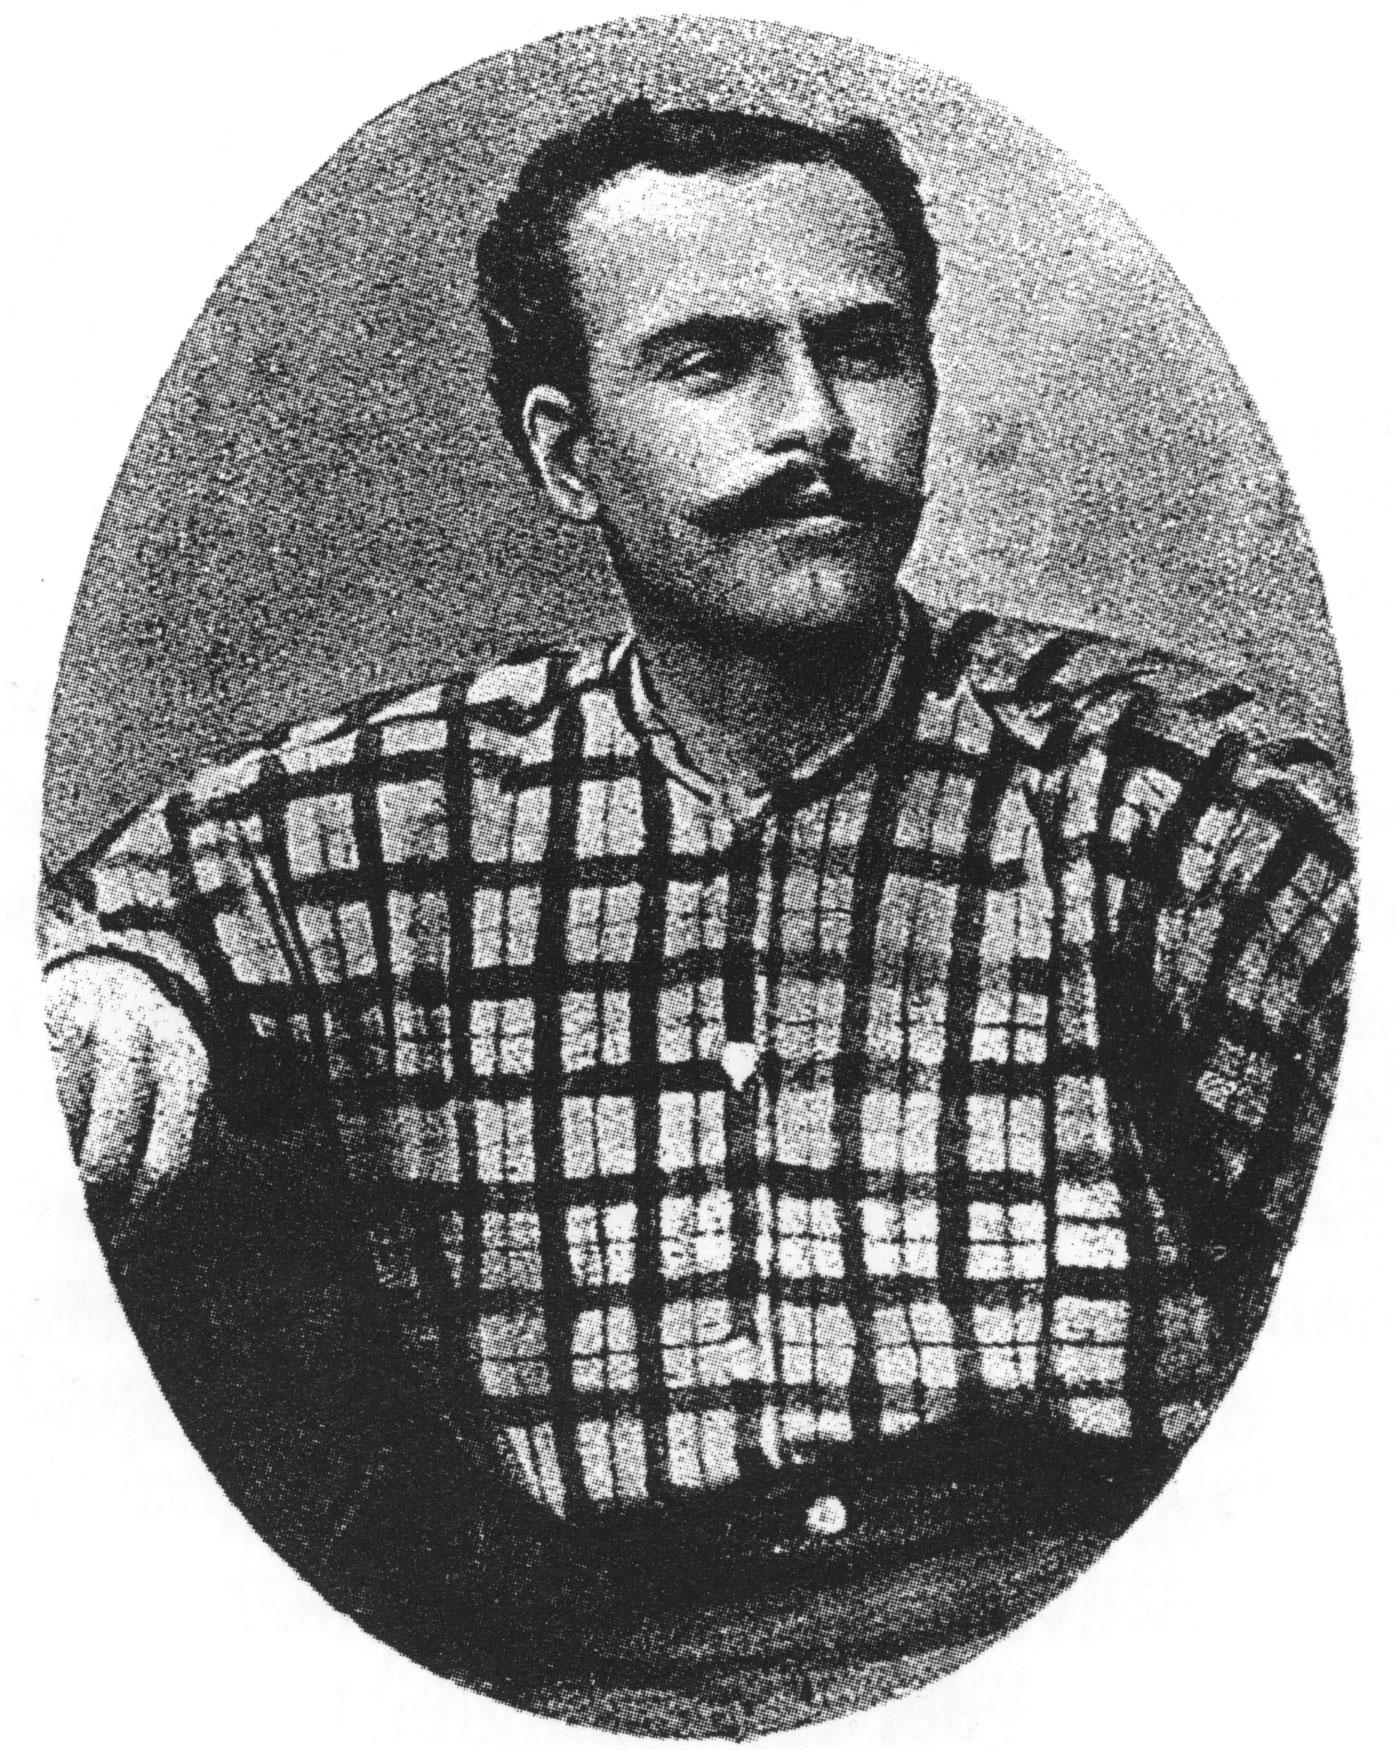 Gennaro Rubino (Vida y obra)